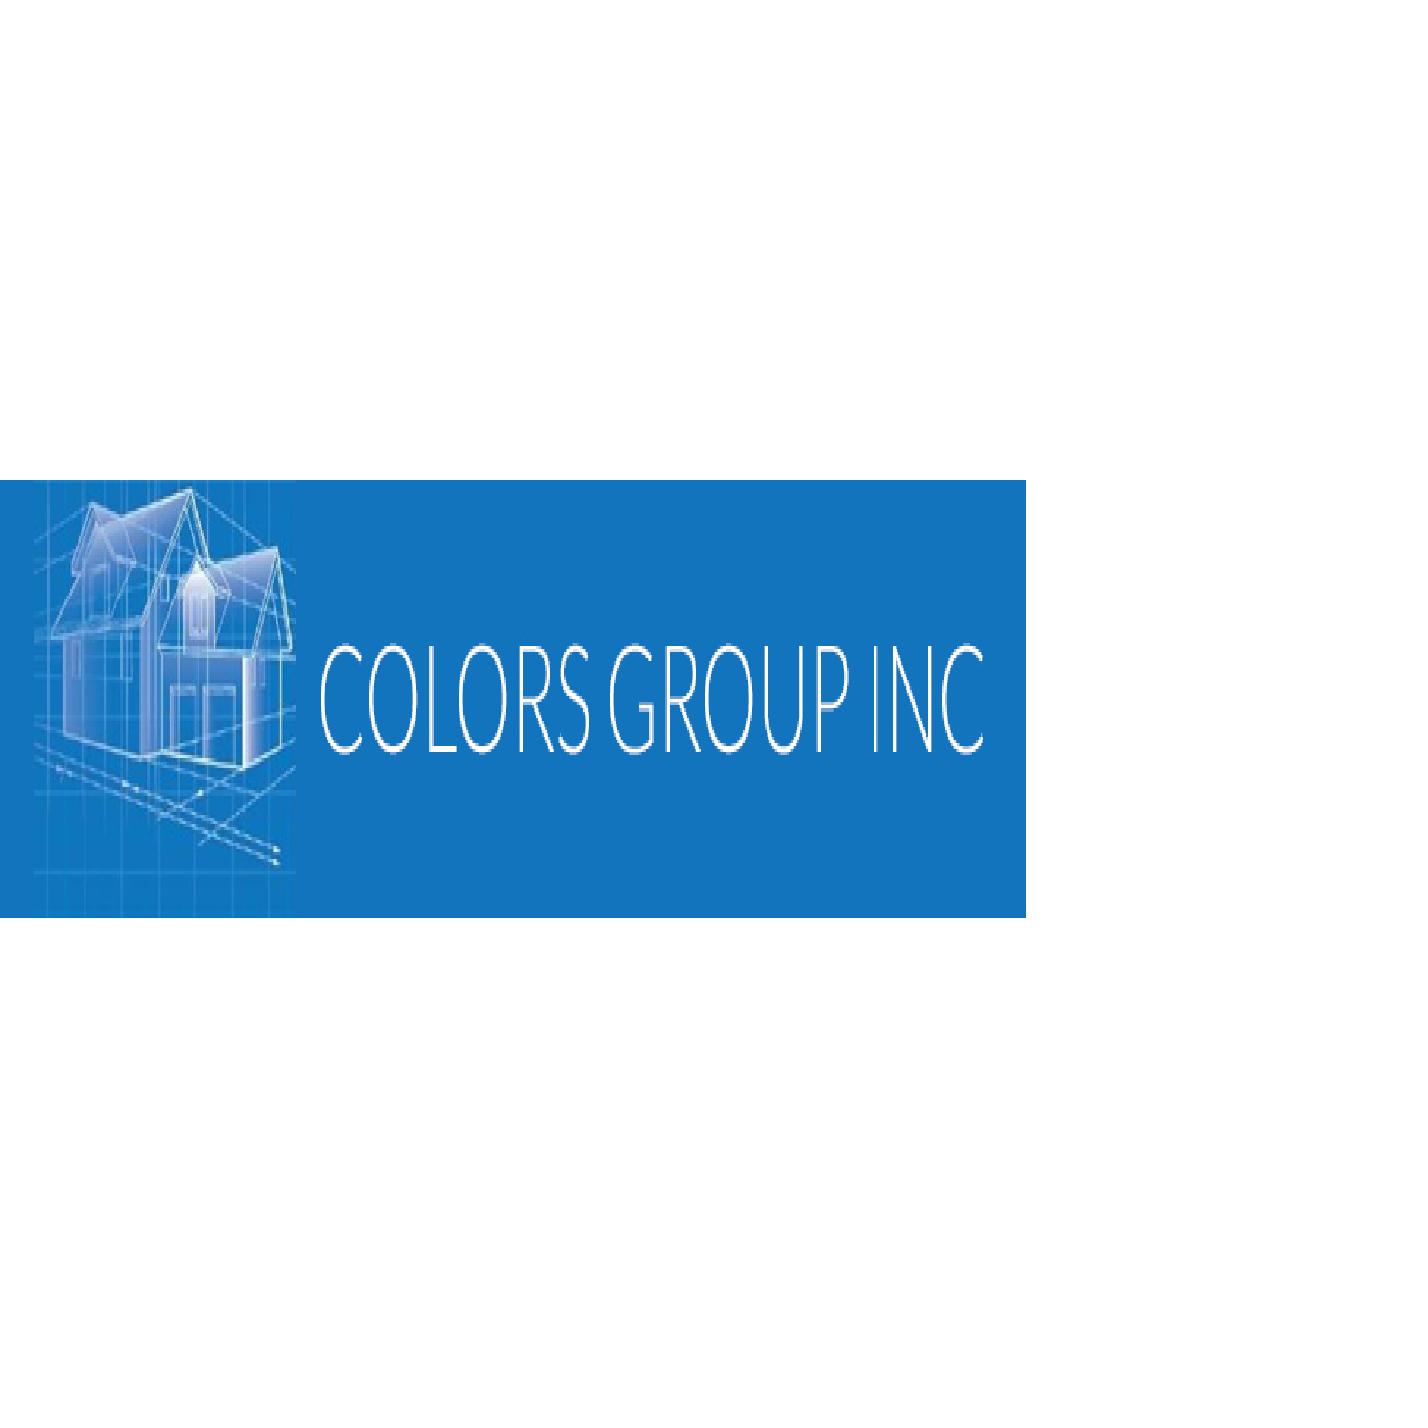 Colors Group Inc